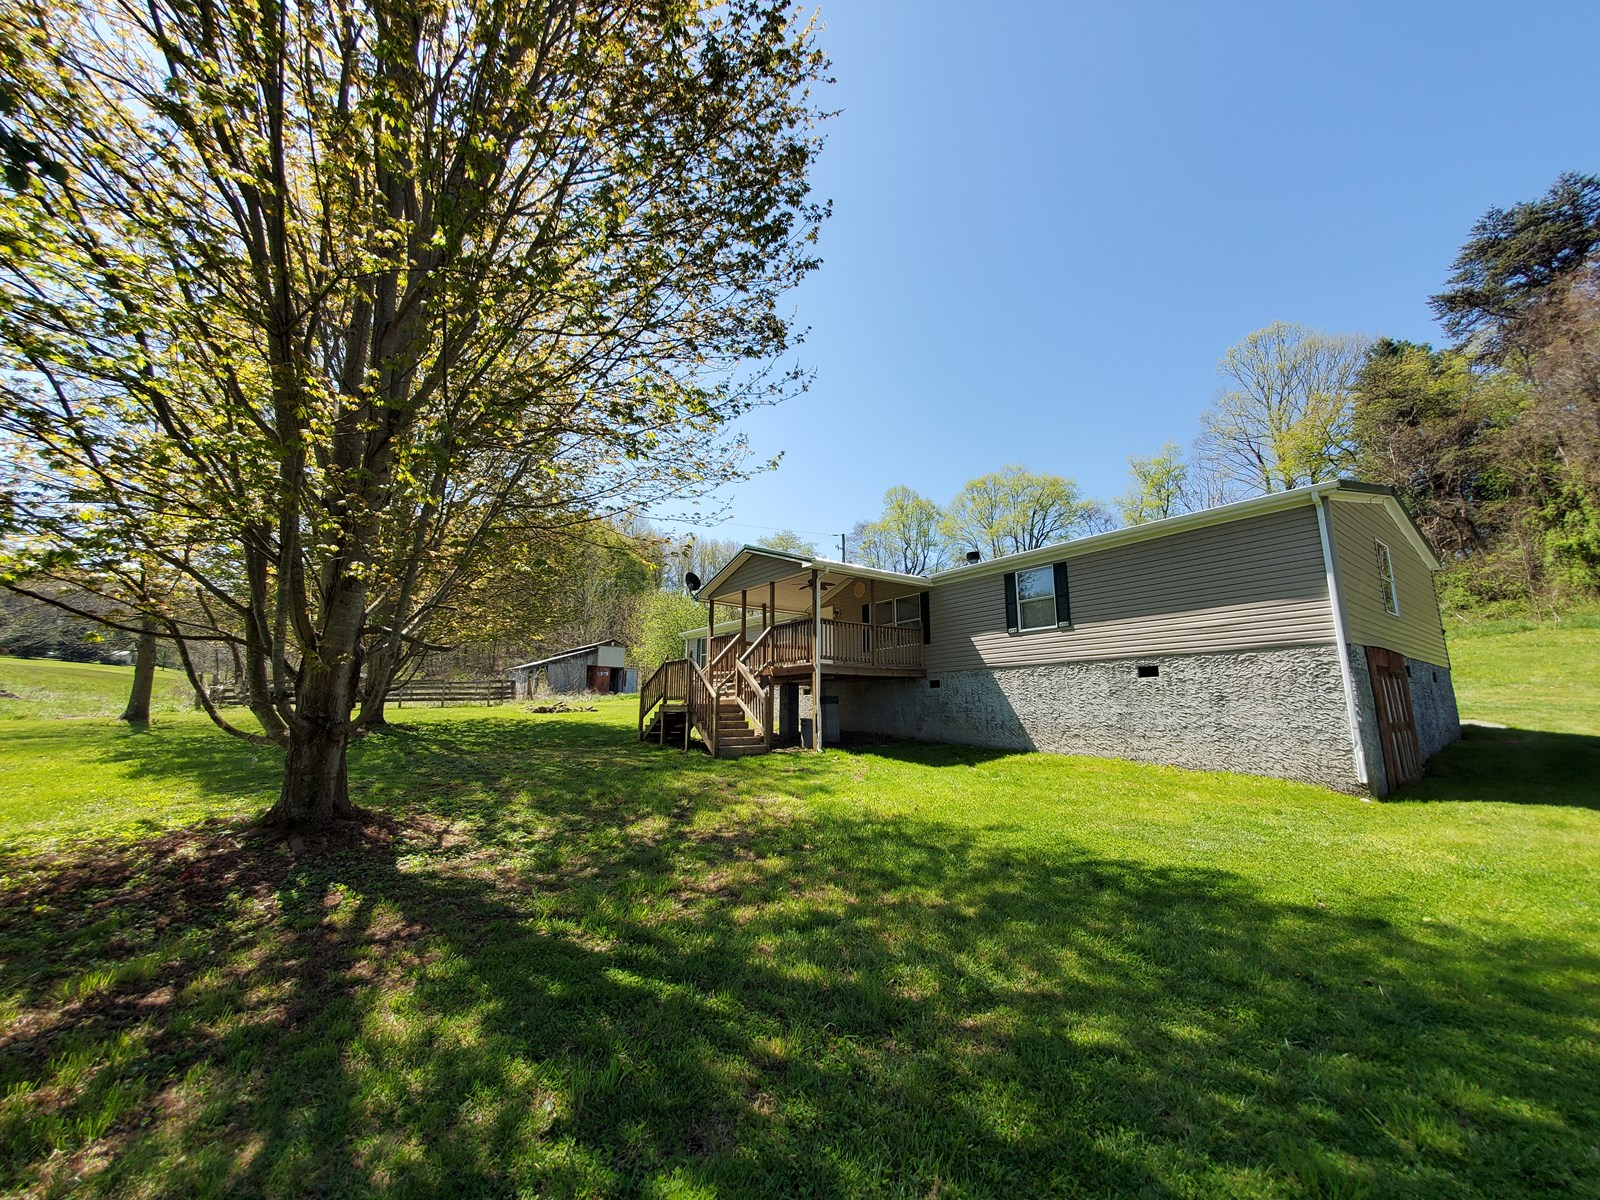 Home for Sale in Glade Spring VA